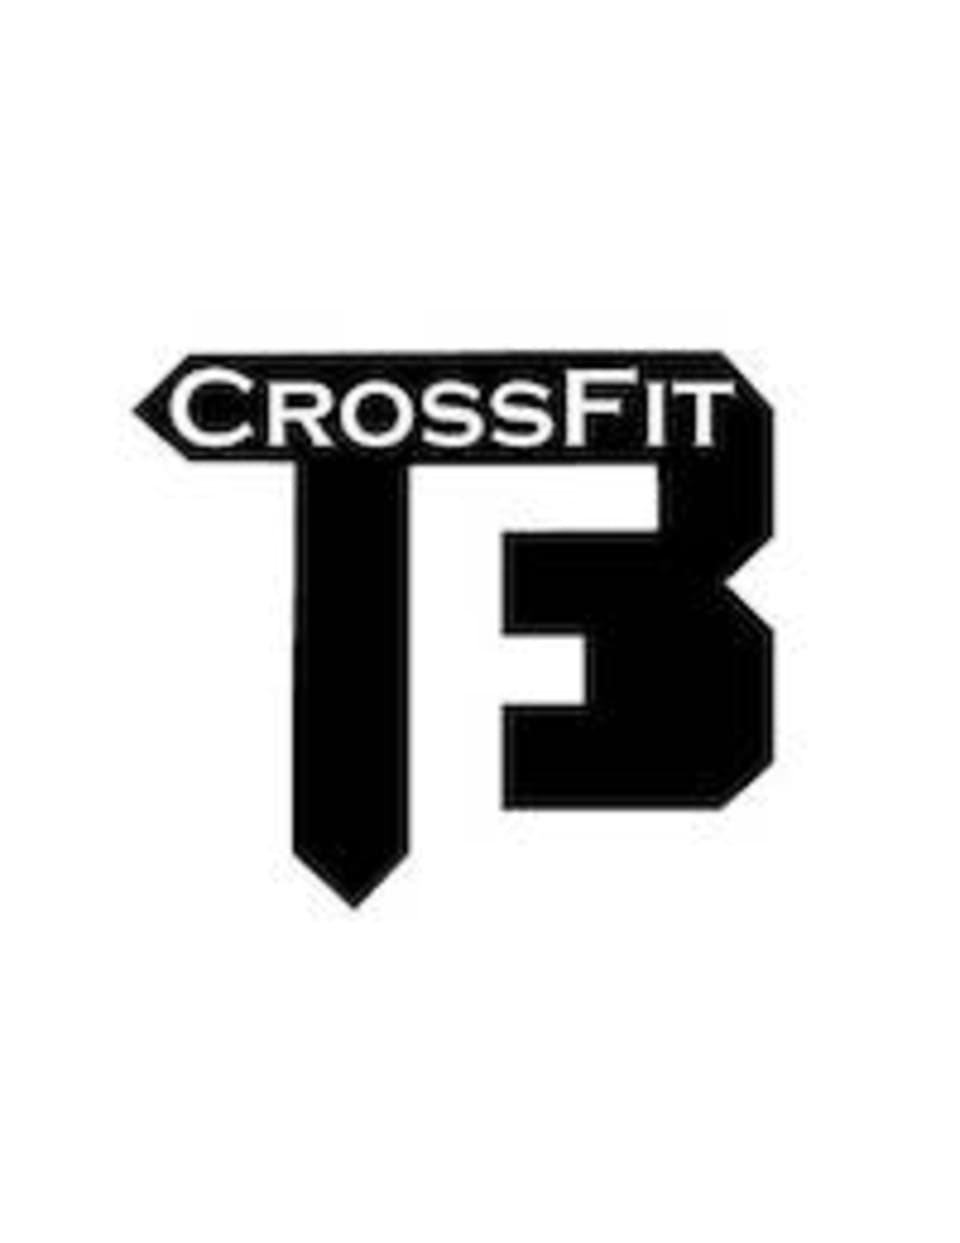 The Fitness Box logo